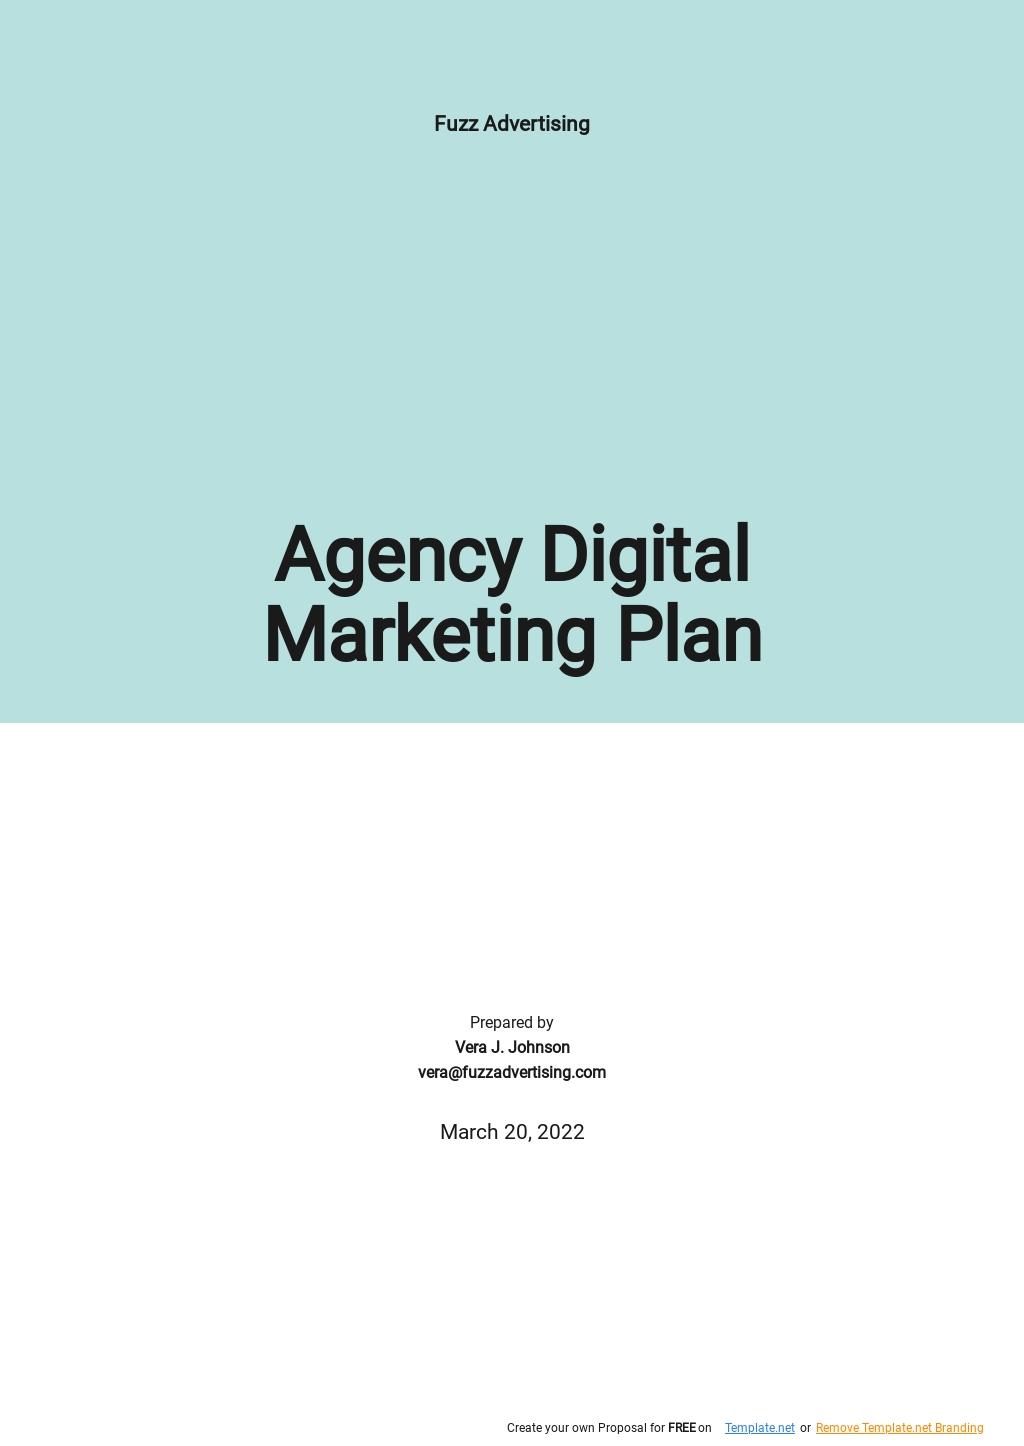 Agency Digital Marketing Plan Template.jpe